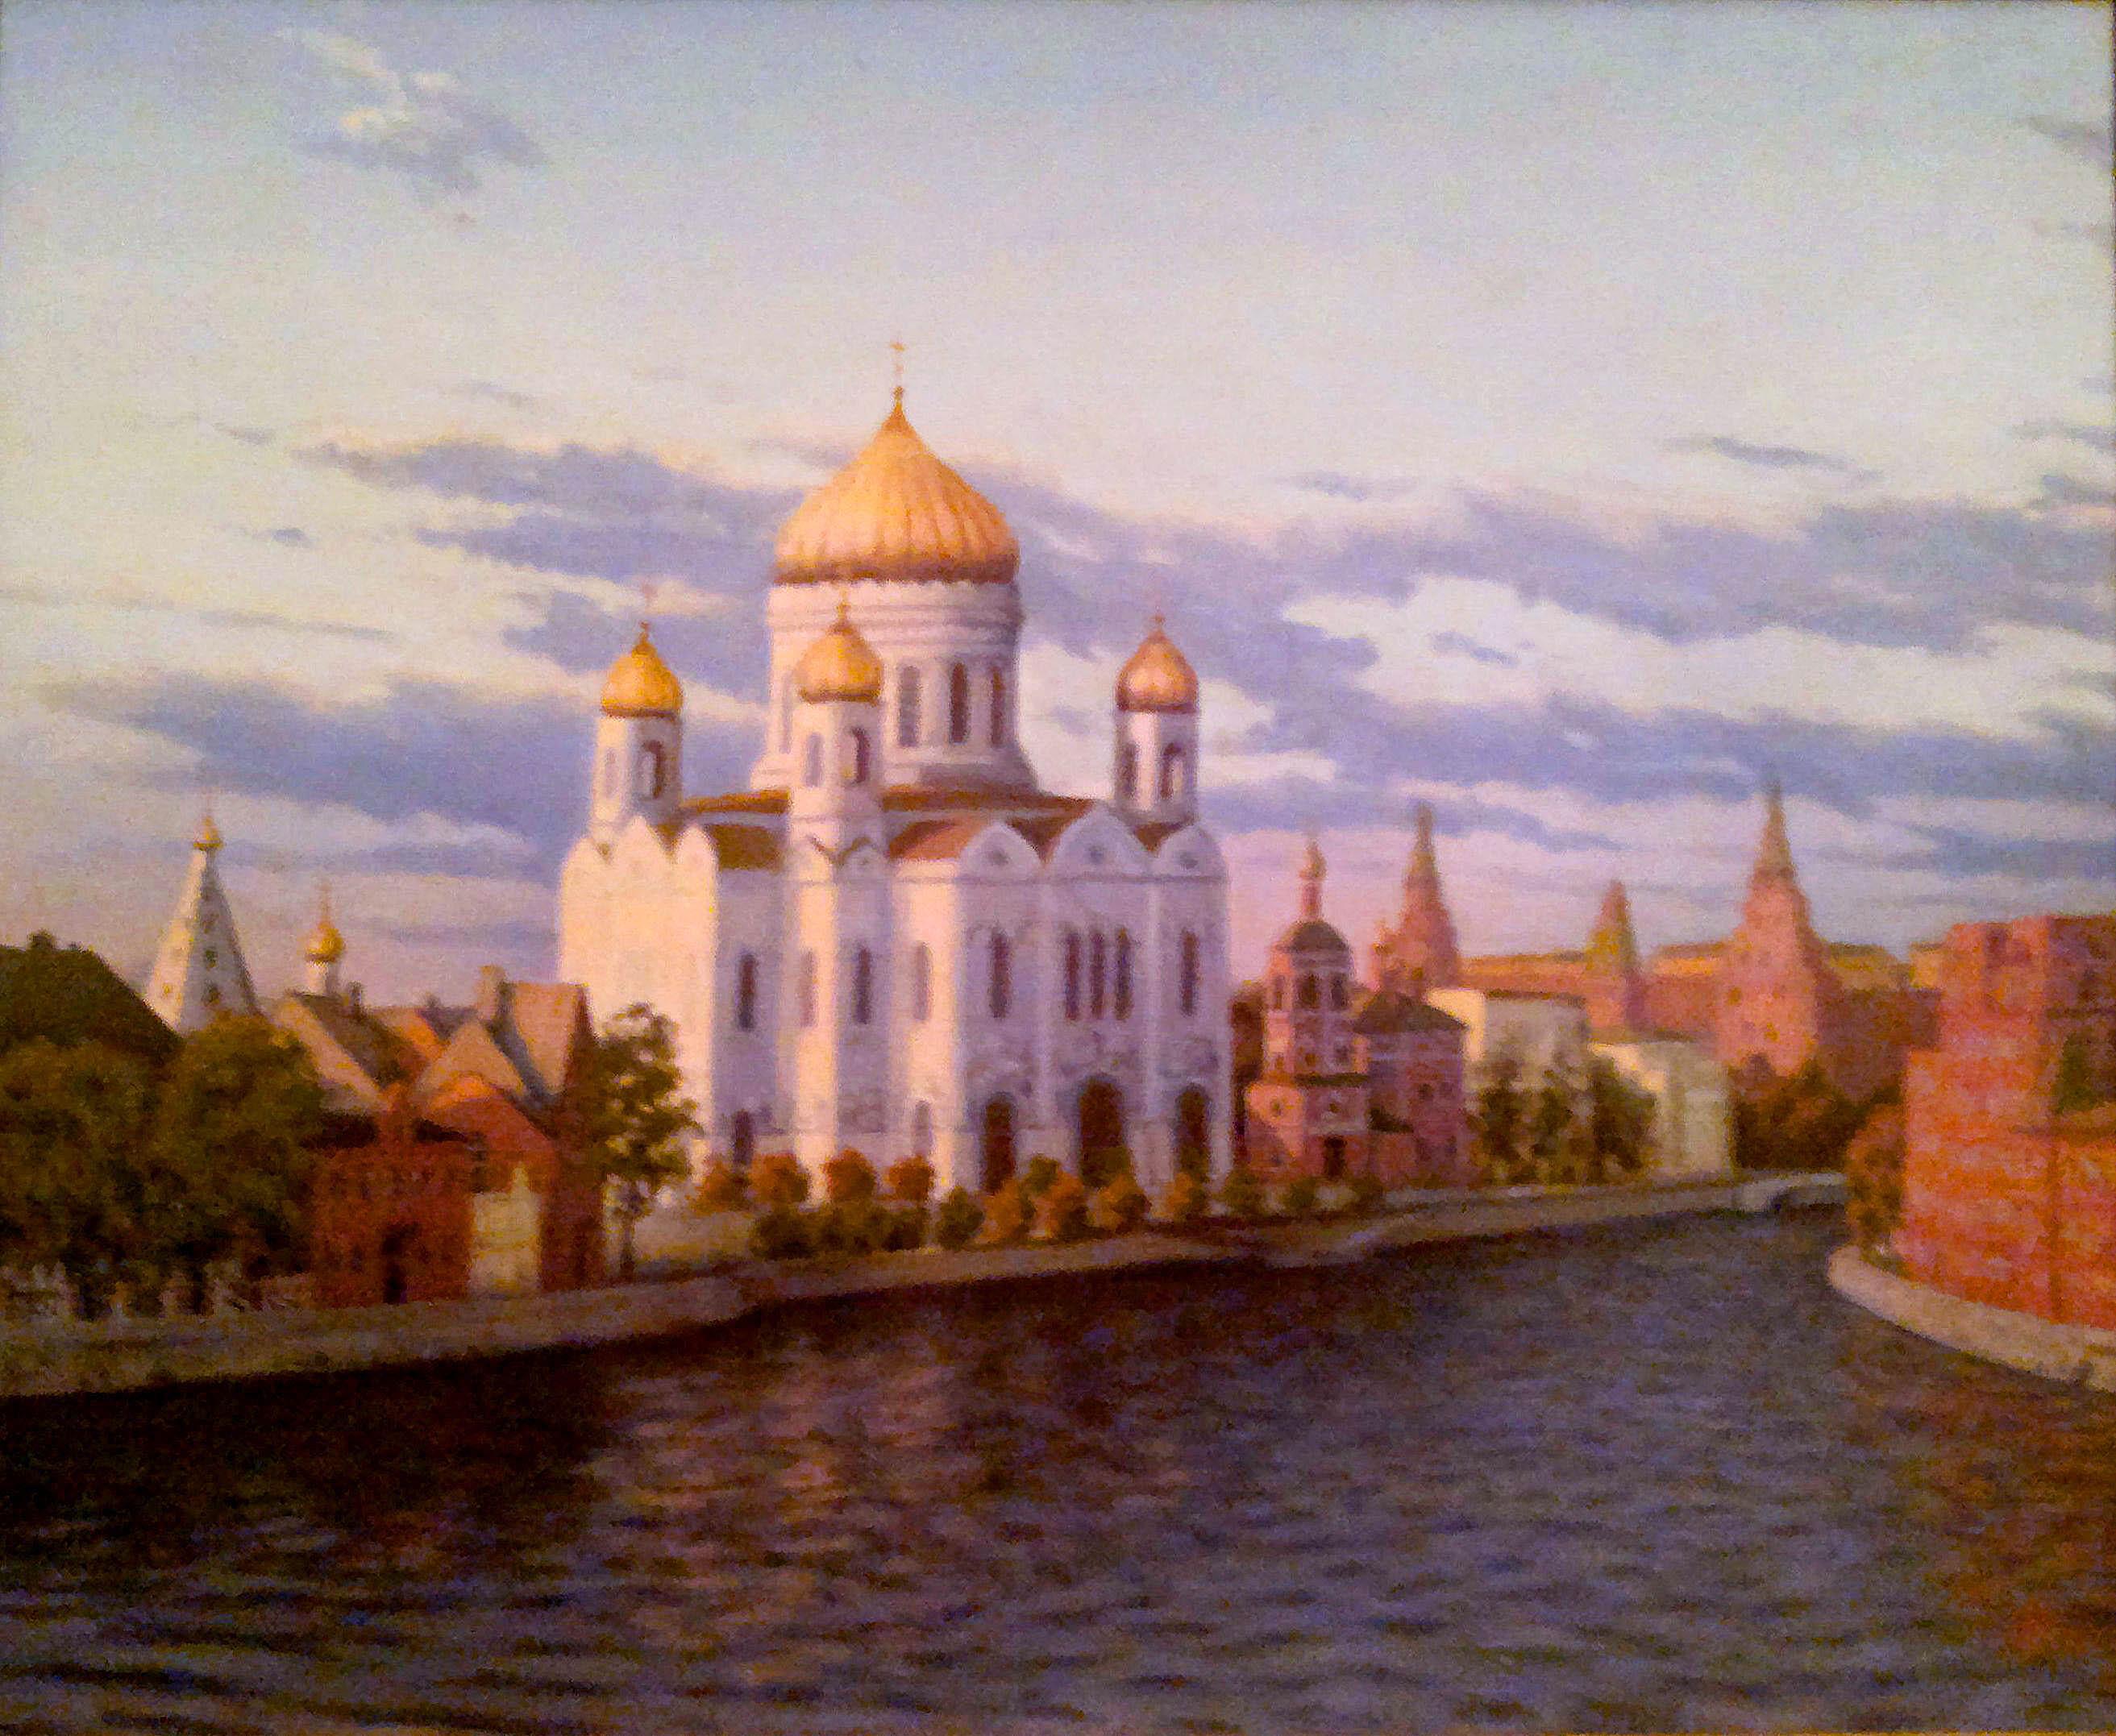 Новостарая Москва/New Old Moscow